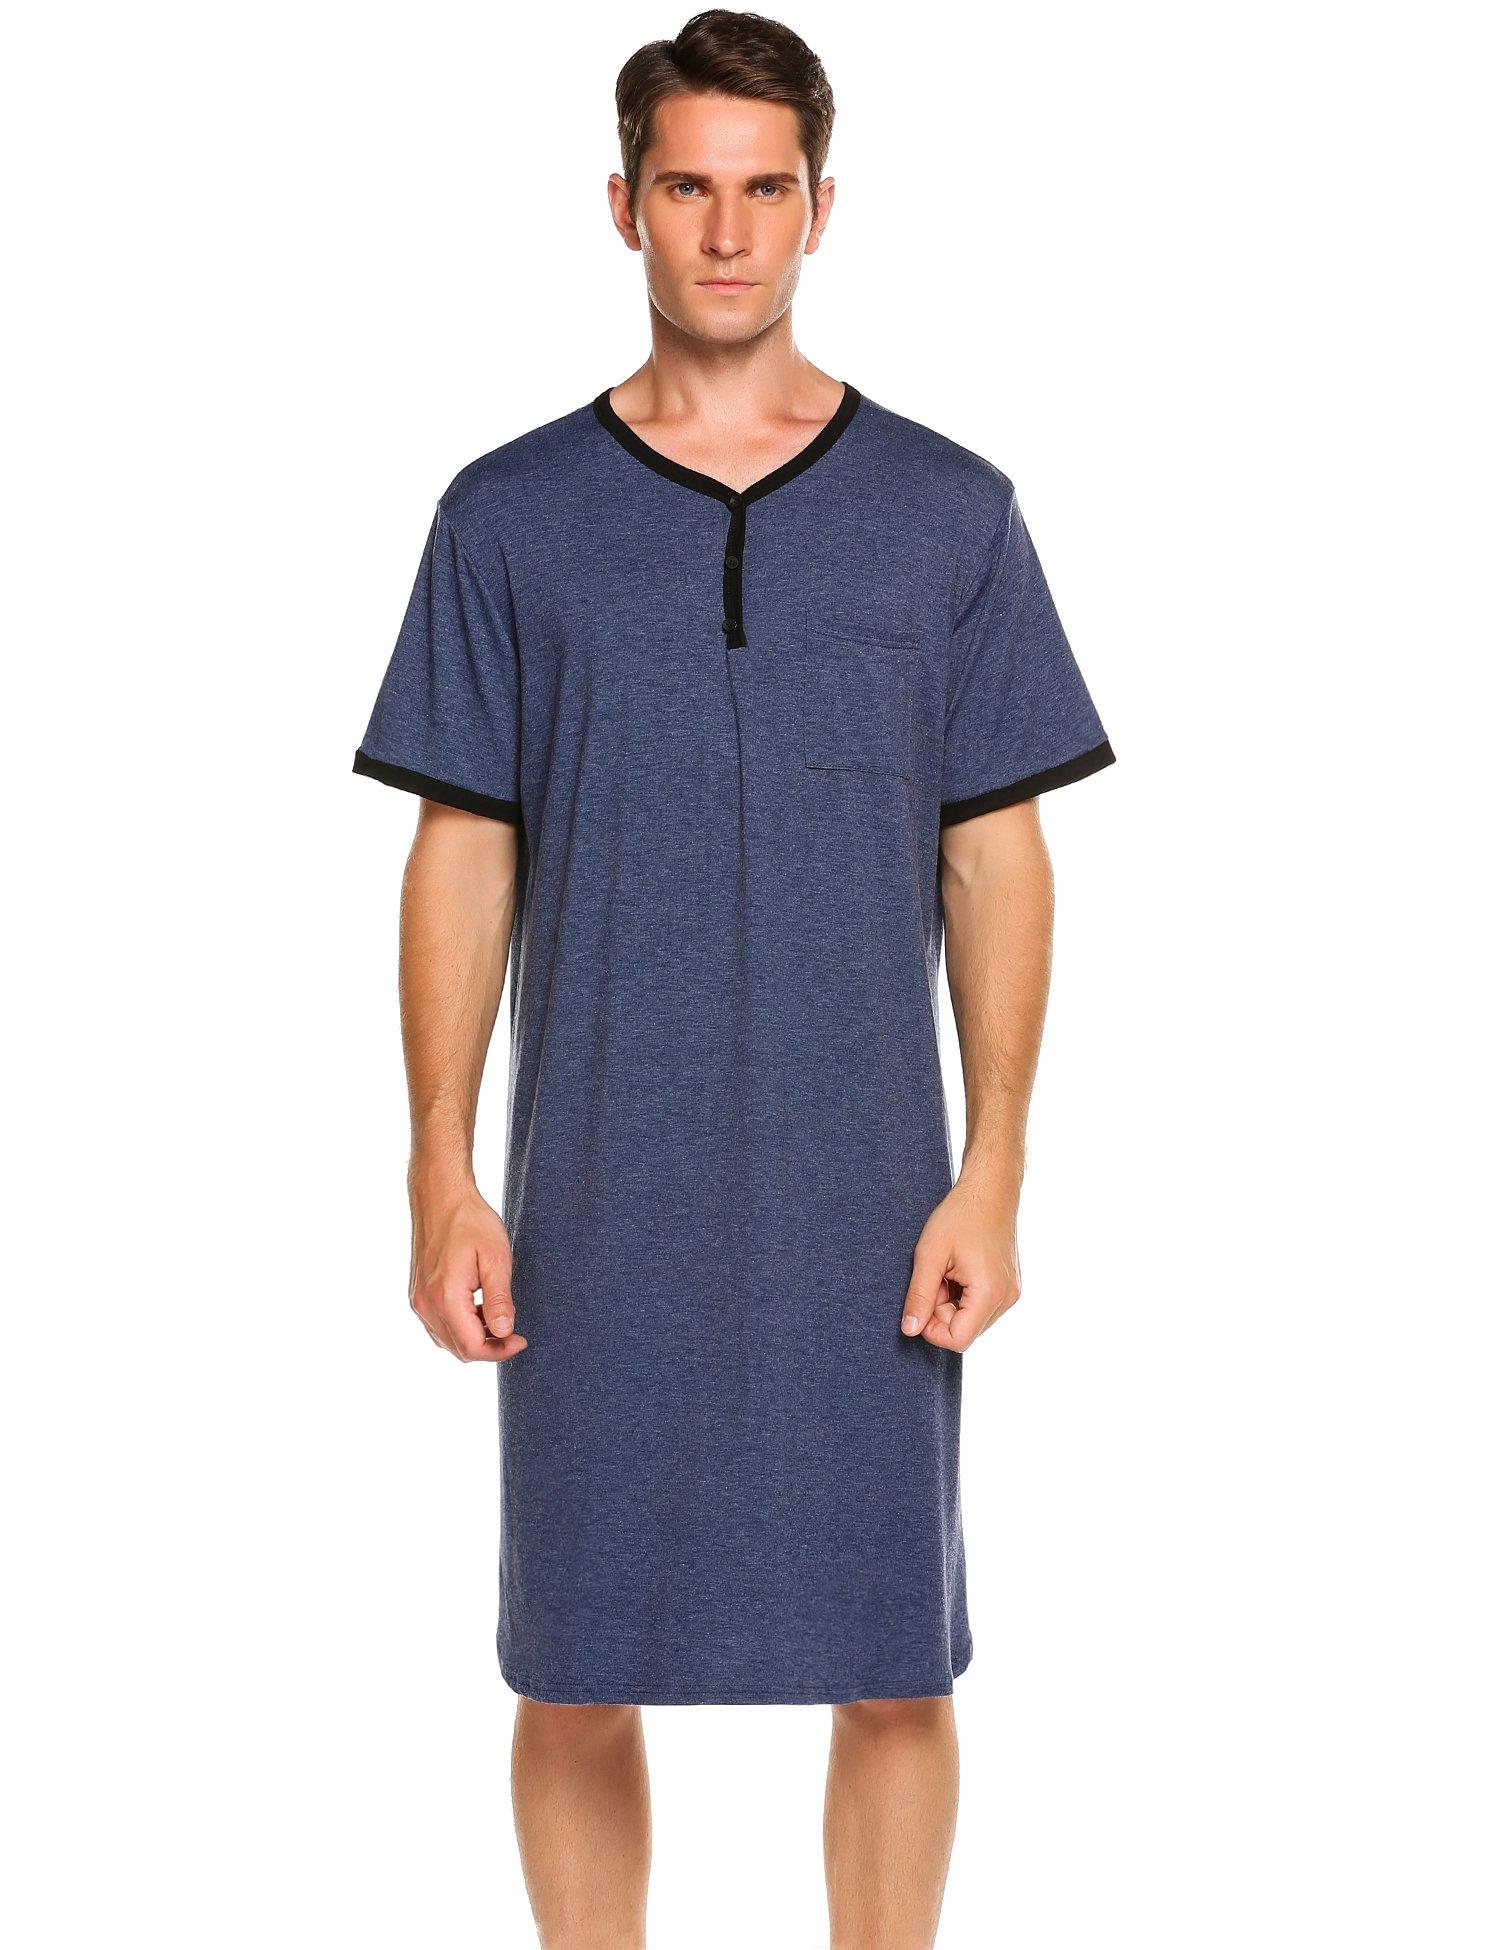 Ekouaer Men's Cotton Nightshirts Kaftan Henley Nightshirt, A-blue, Large